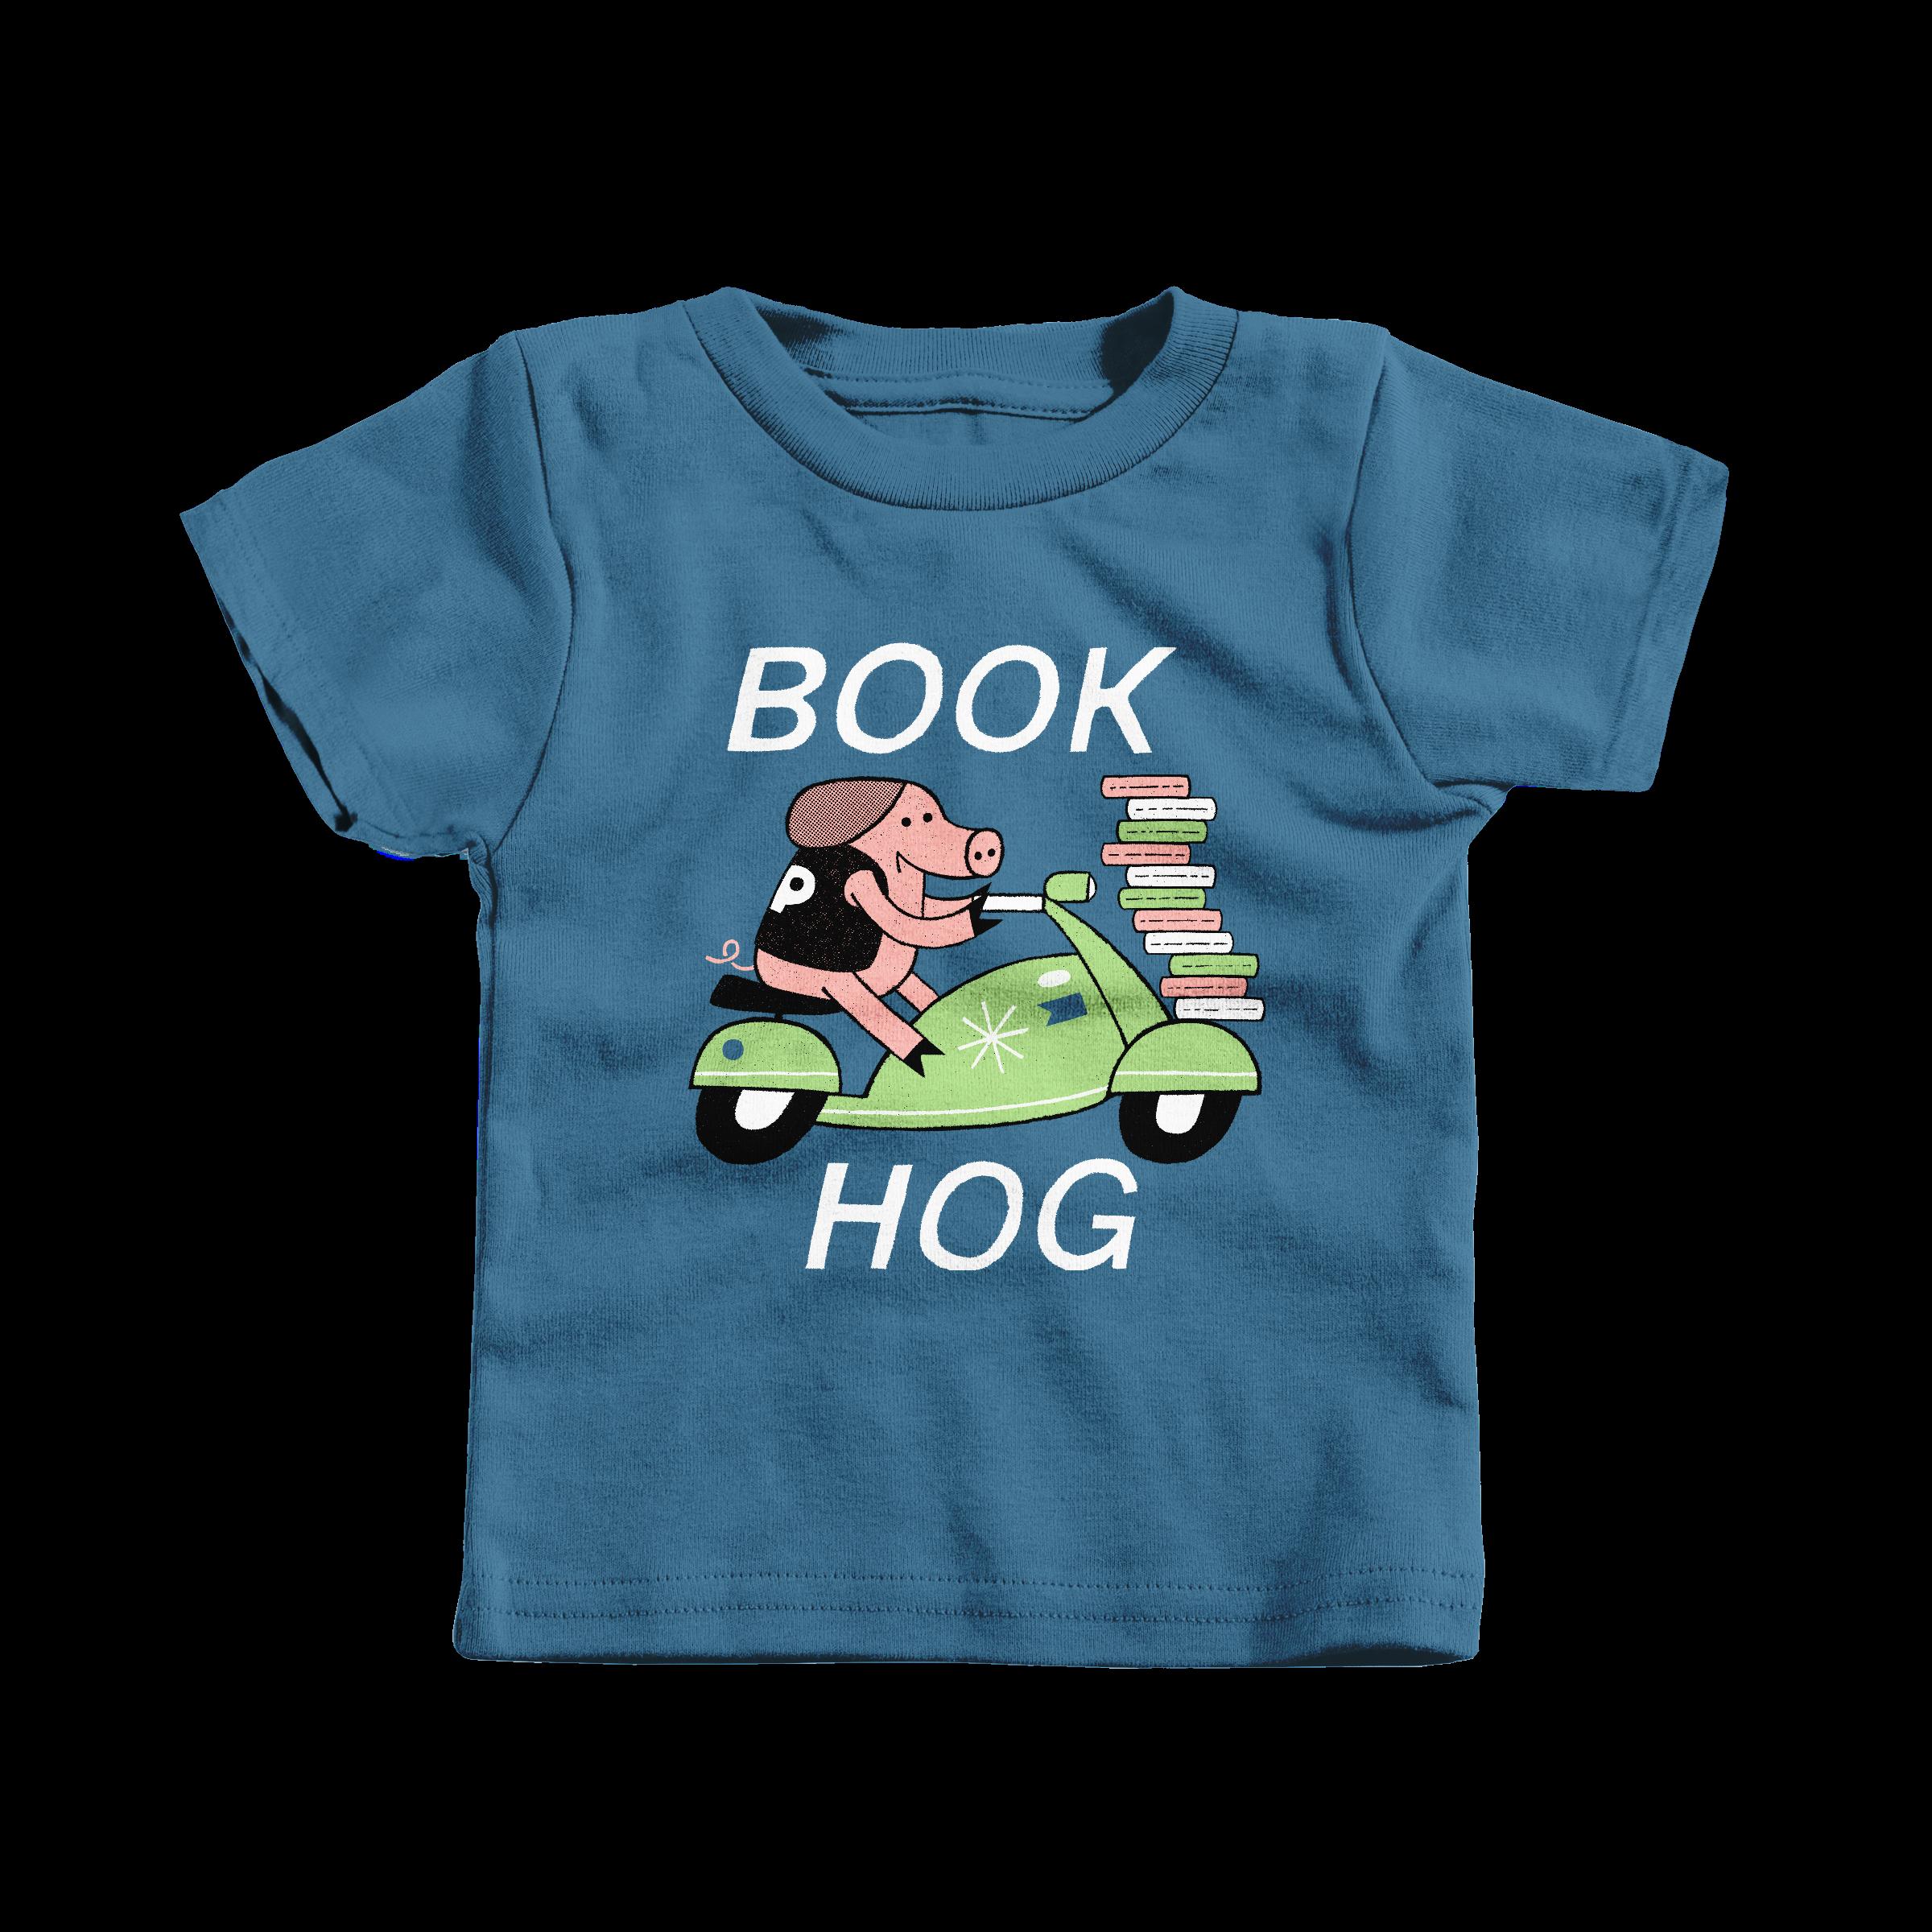 Book Hog!